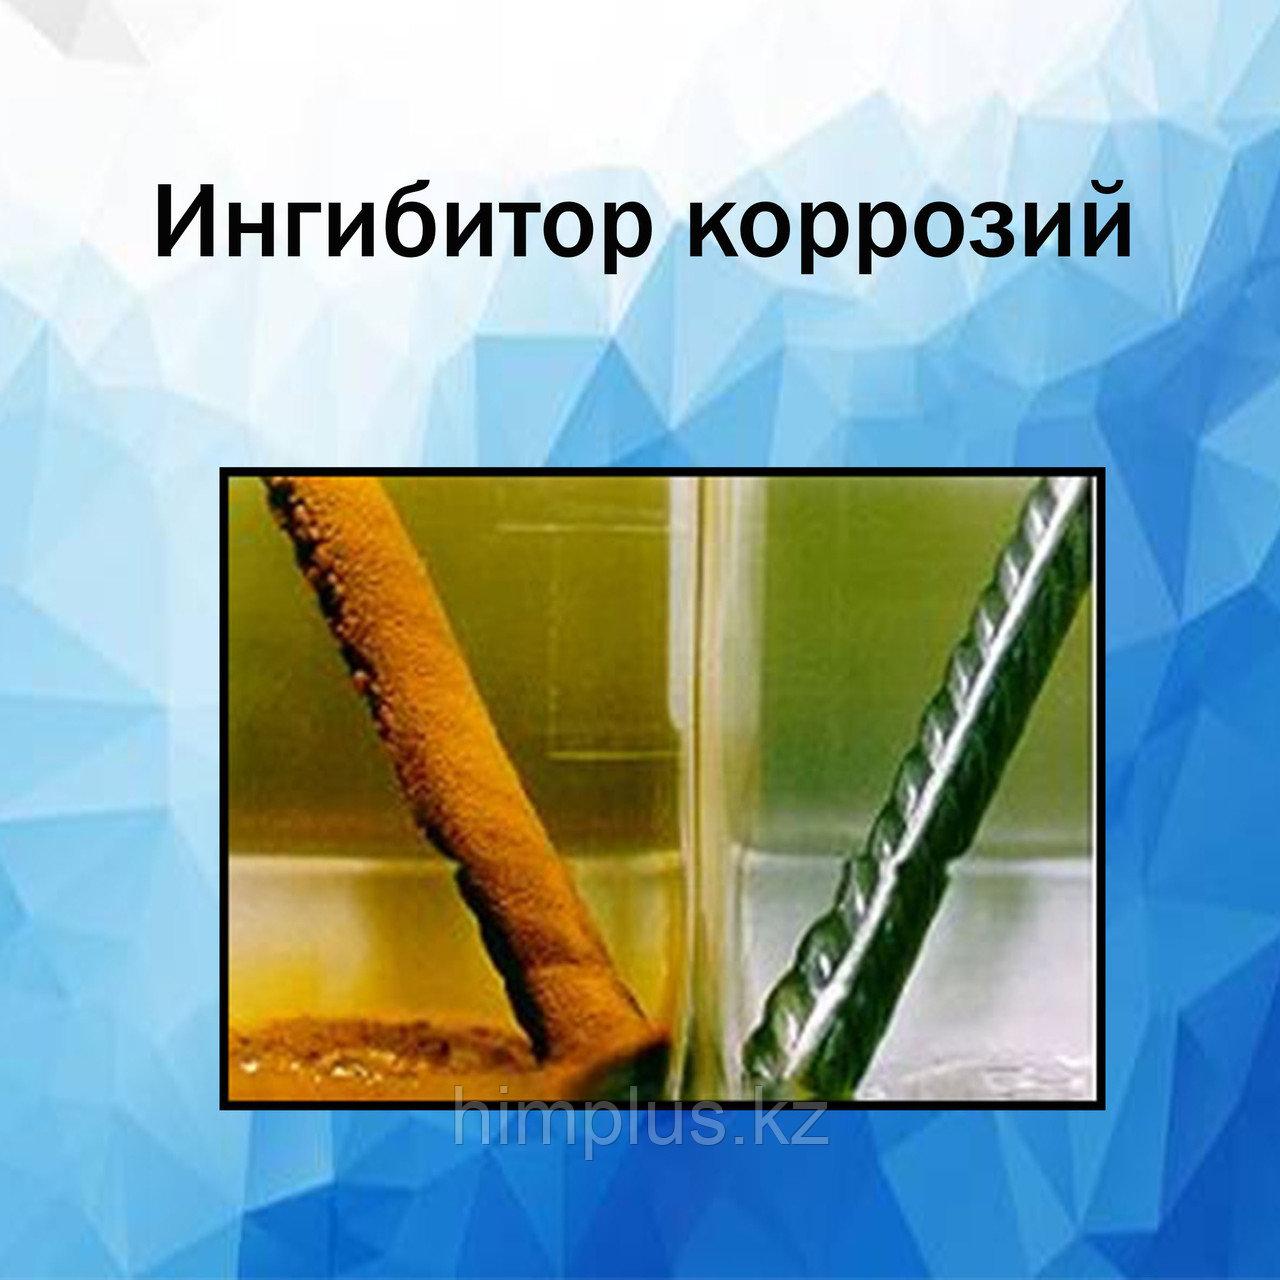 Ингибитор коррозии